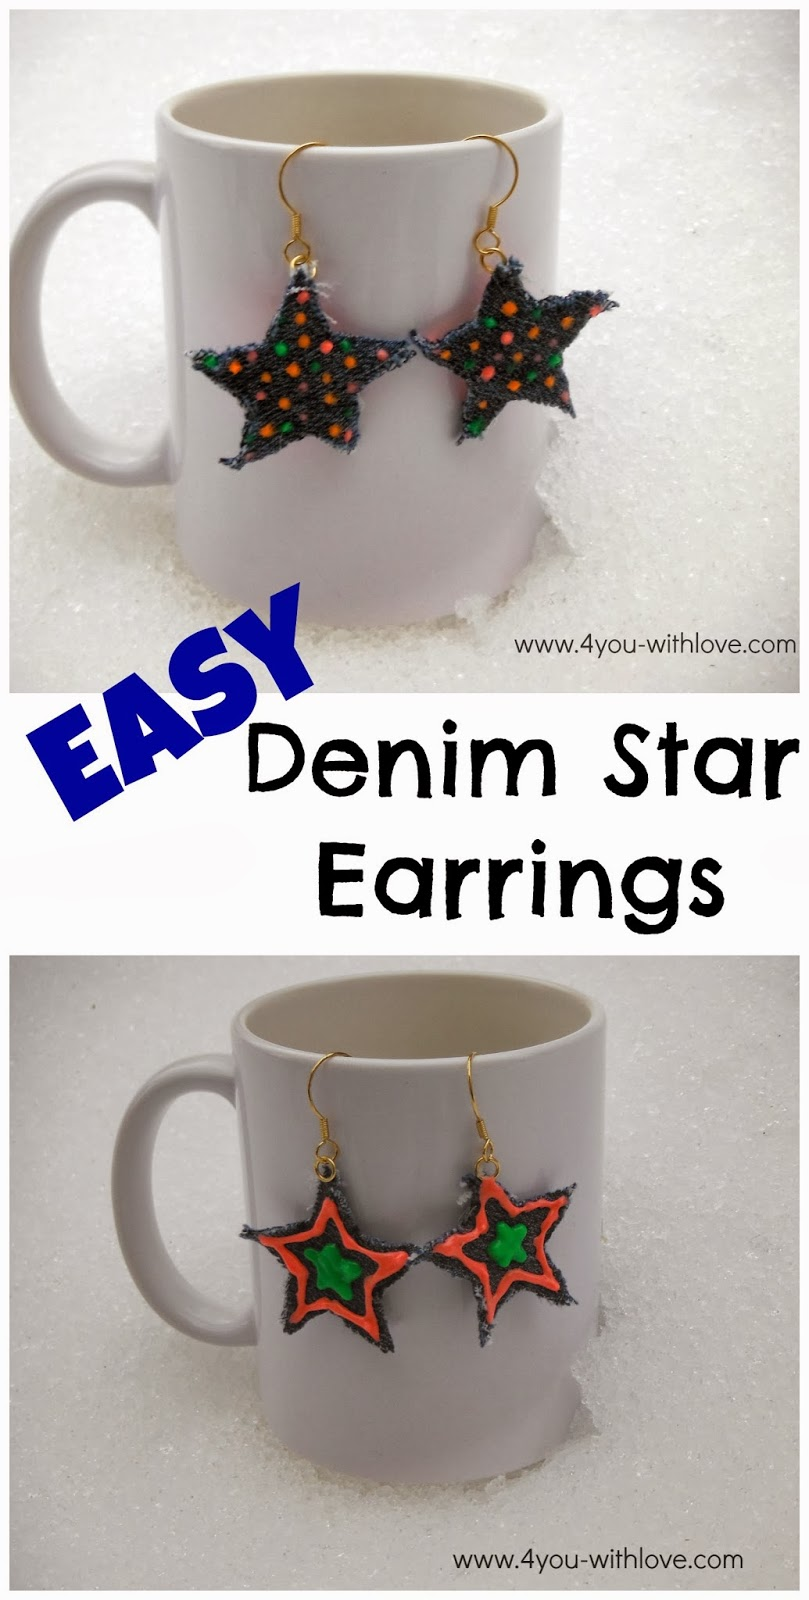 Denim Star Earrings with Tulip Neon Paint